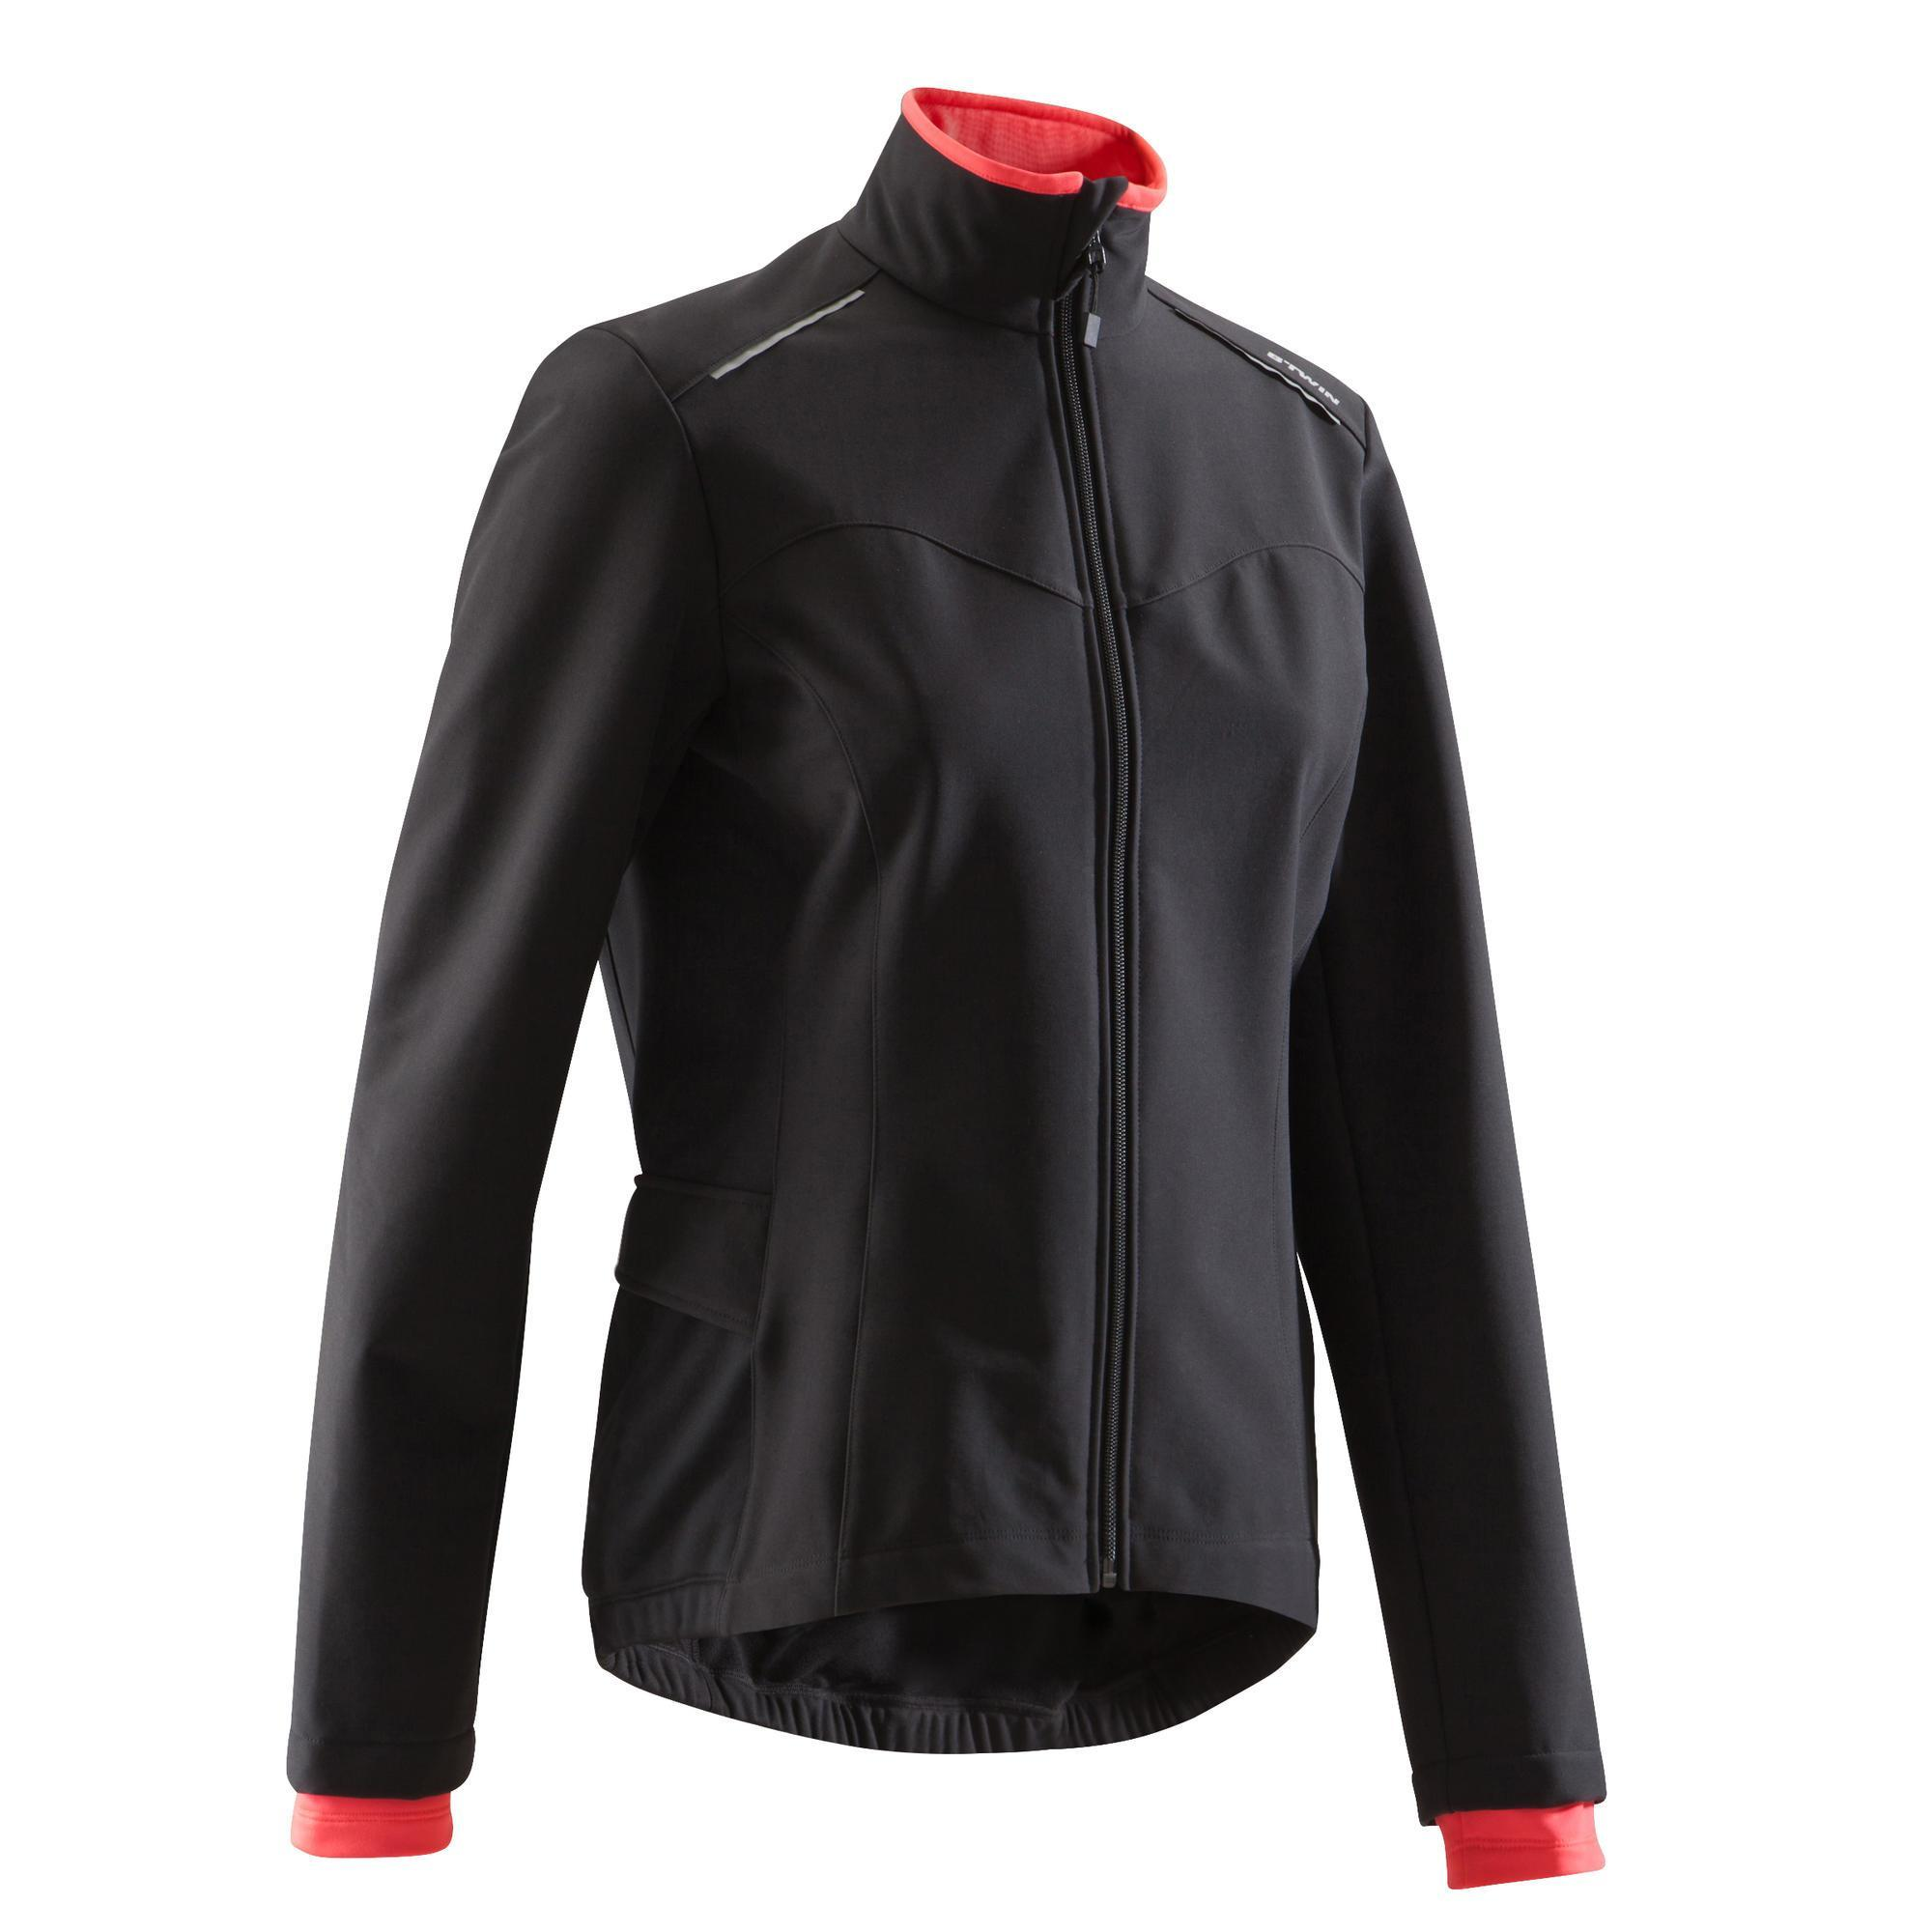 Fahrradjacke 100 Damen schwarz | Sportbekleidung > Sportjacken > Fahrradjacken | Schwarz - Rot - Rosa | Triban